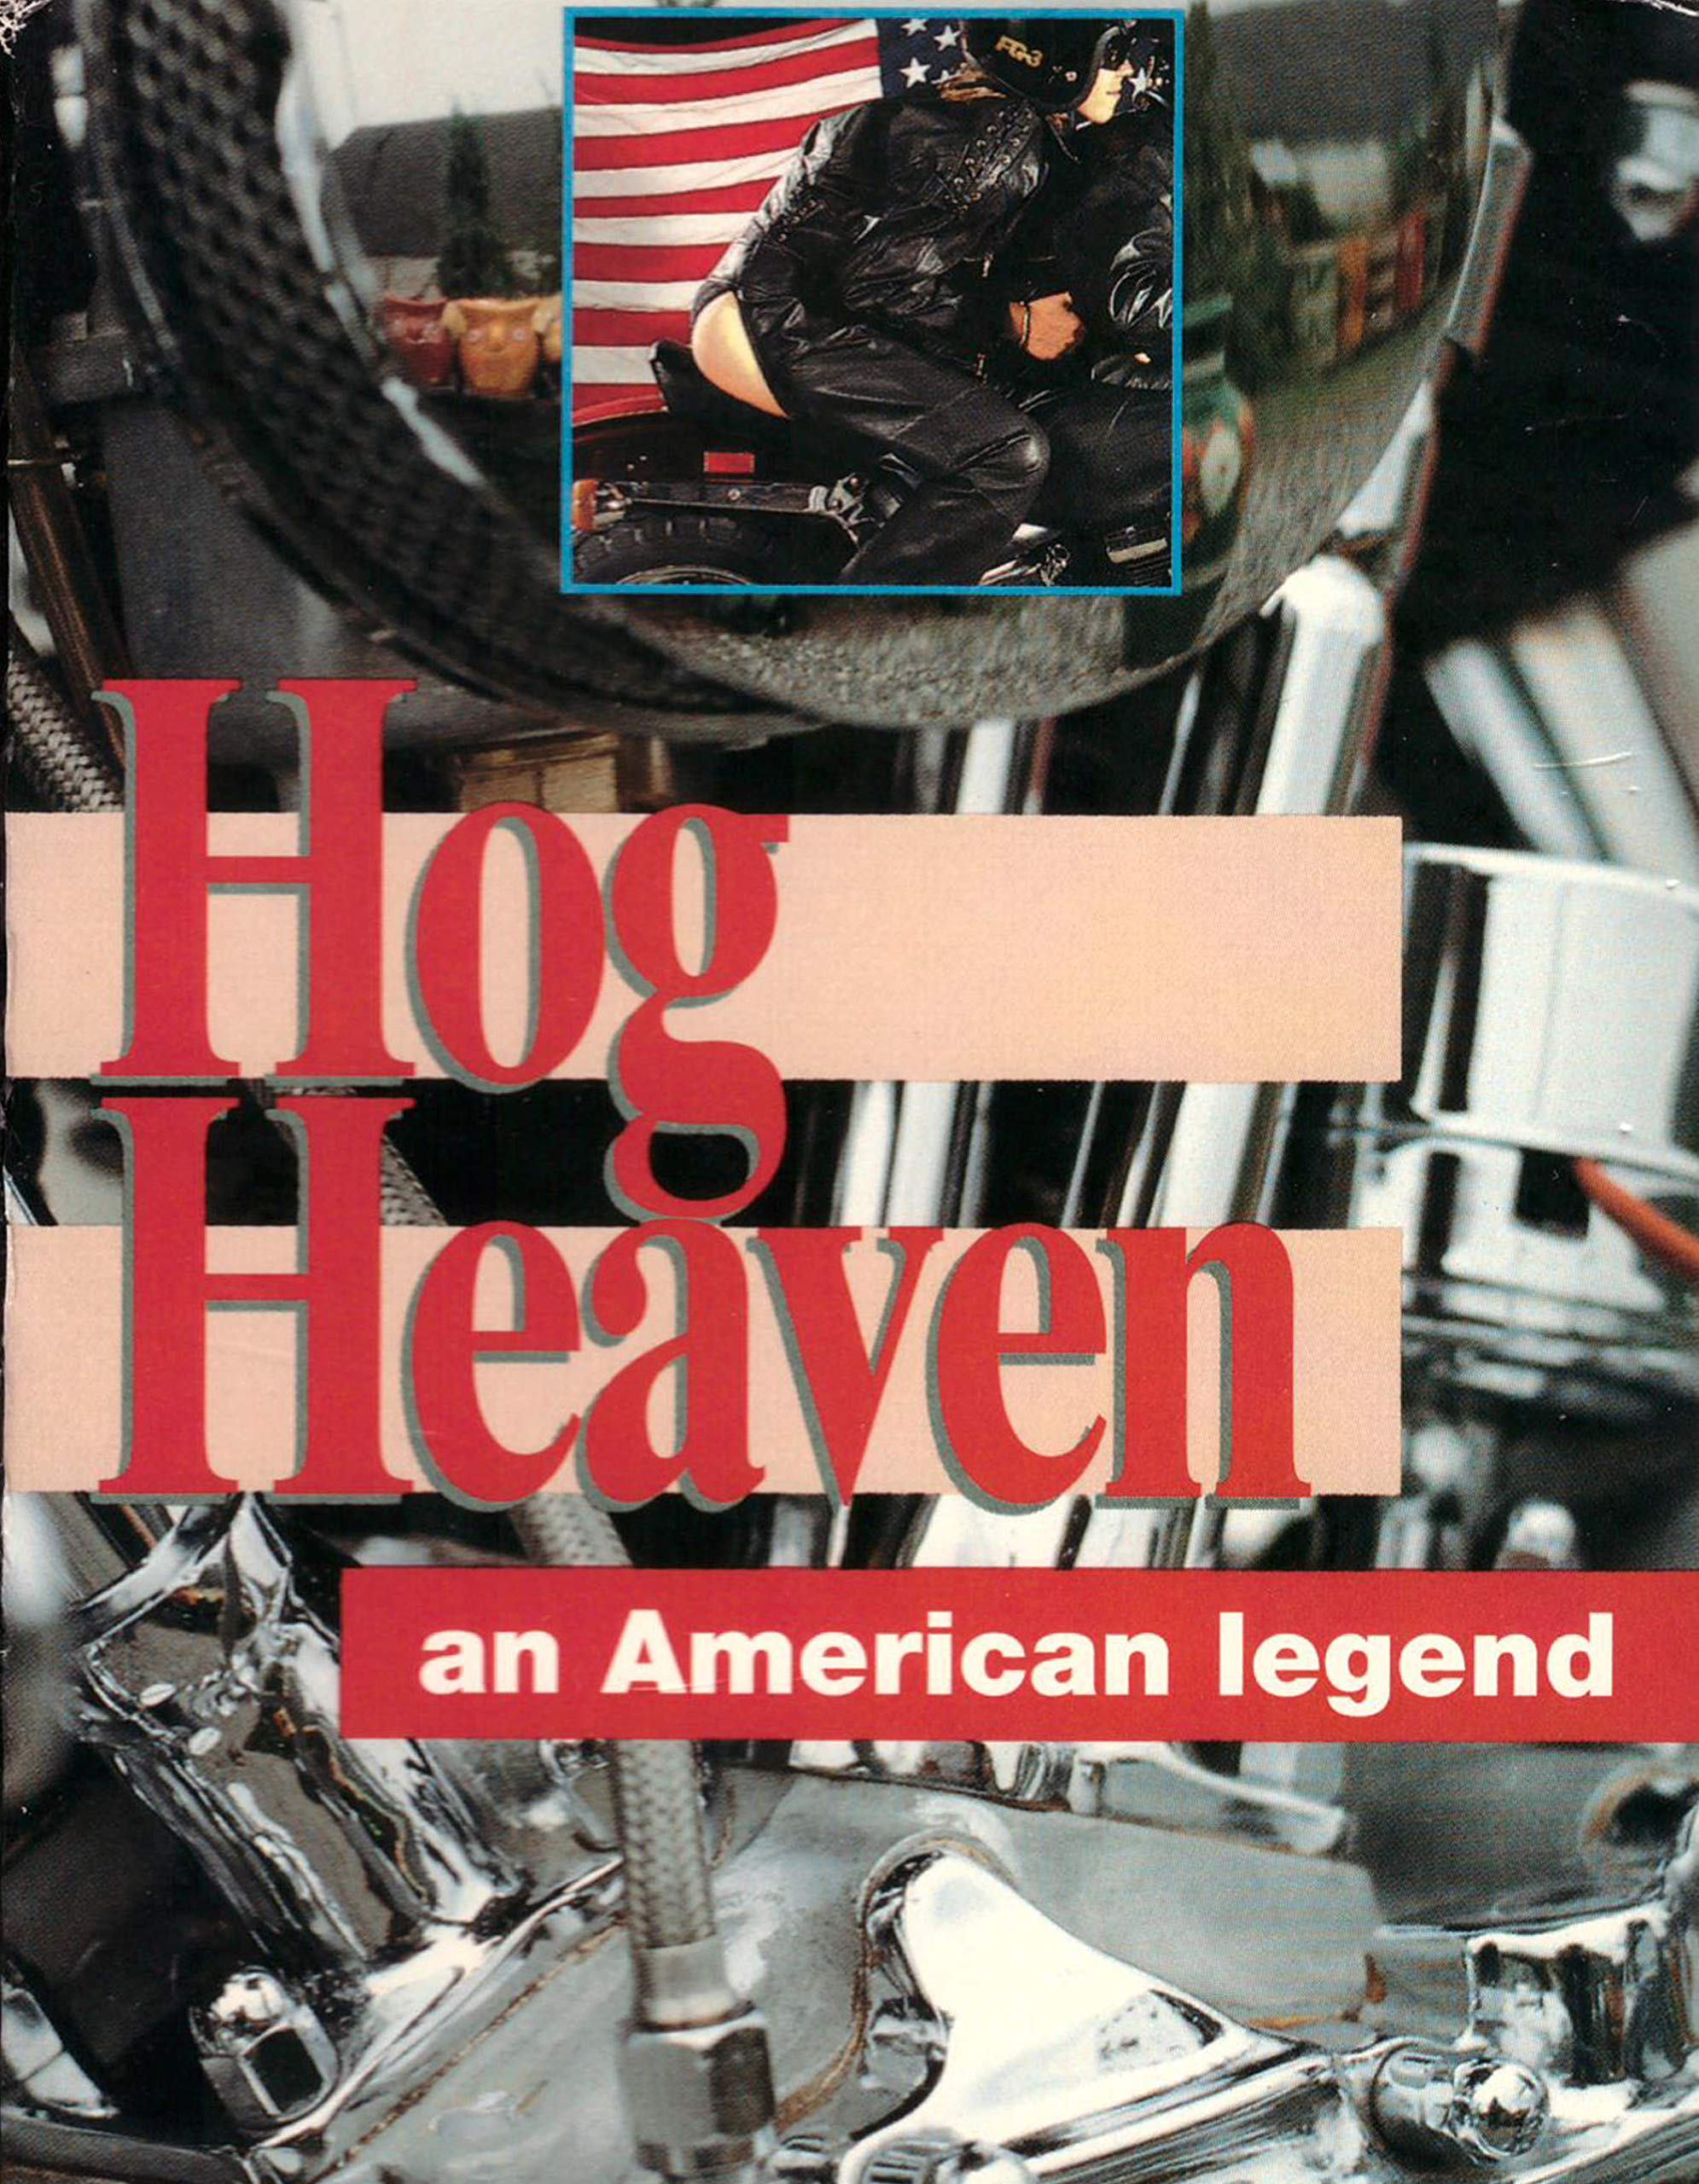 Hog Heaven an American Legend - Extended